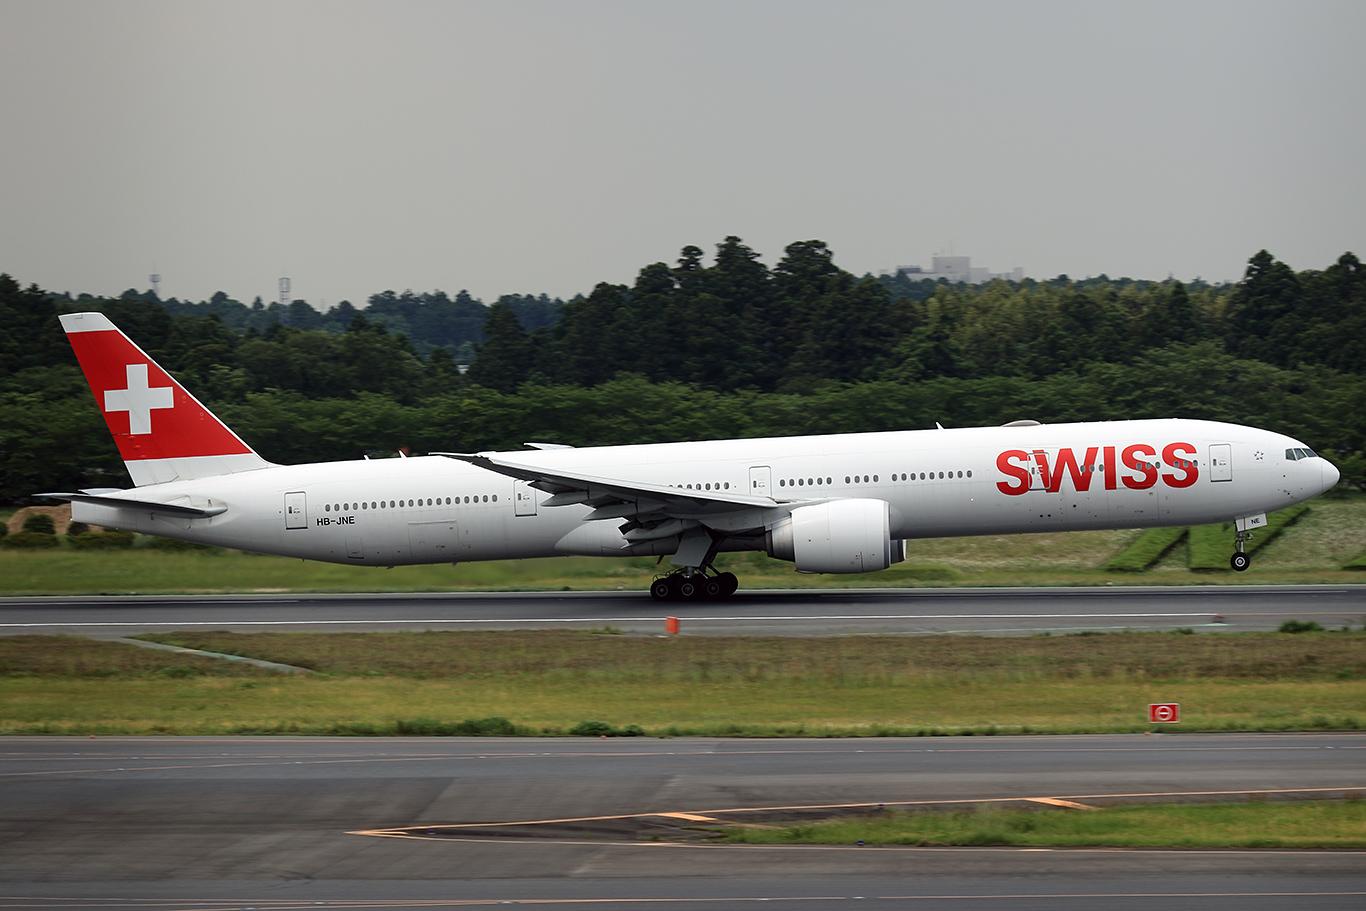 LX/SWR/スイス国際航空 LX161 B777-300ER HB-JNE